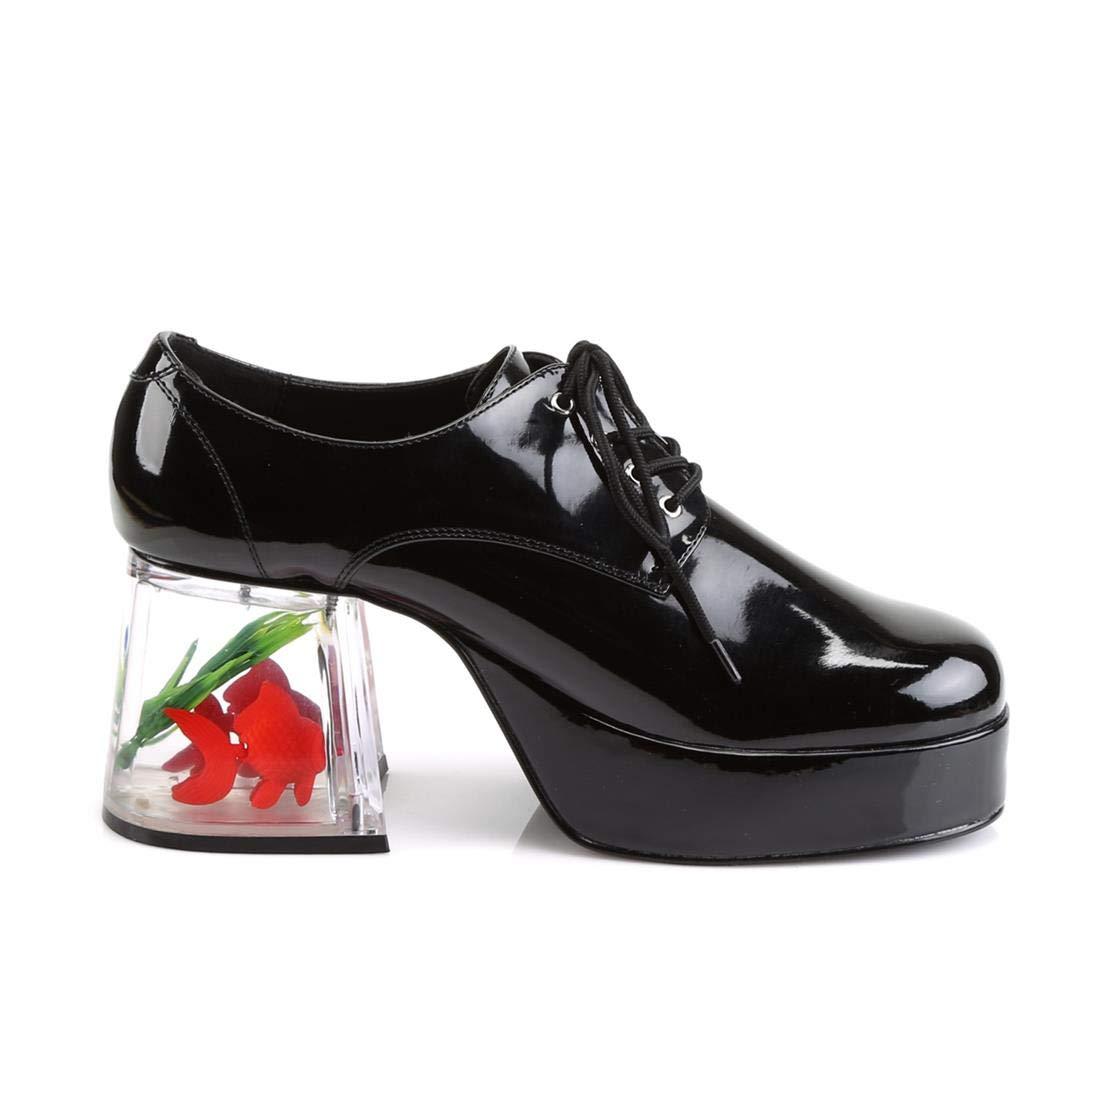 crazy insane clear heel fish bown platform pimp shoes for